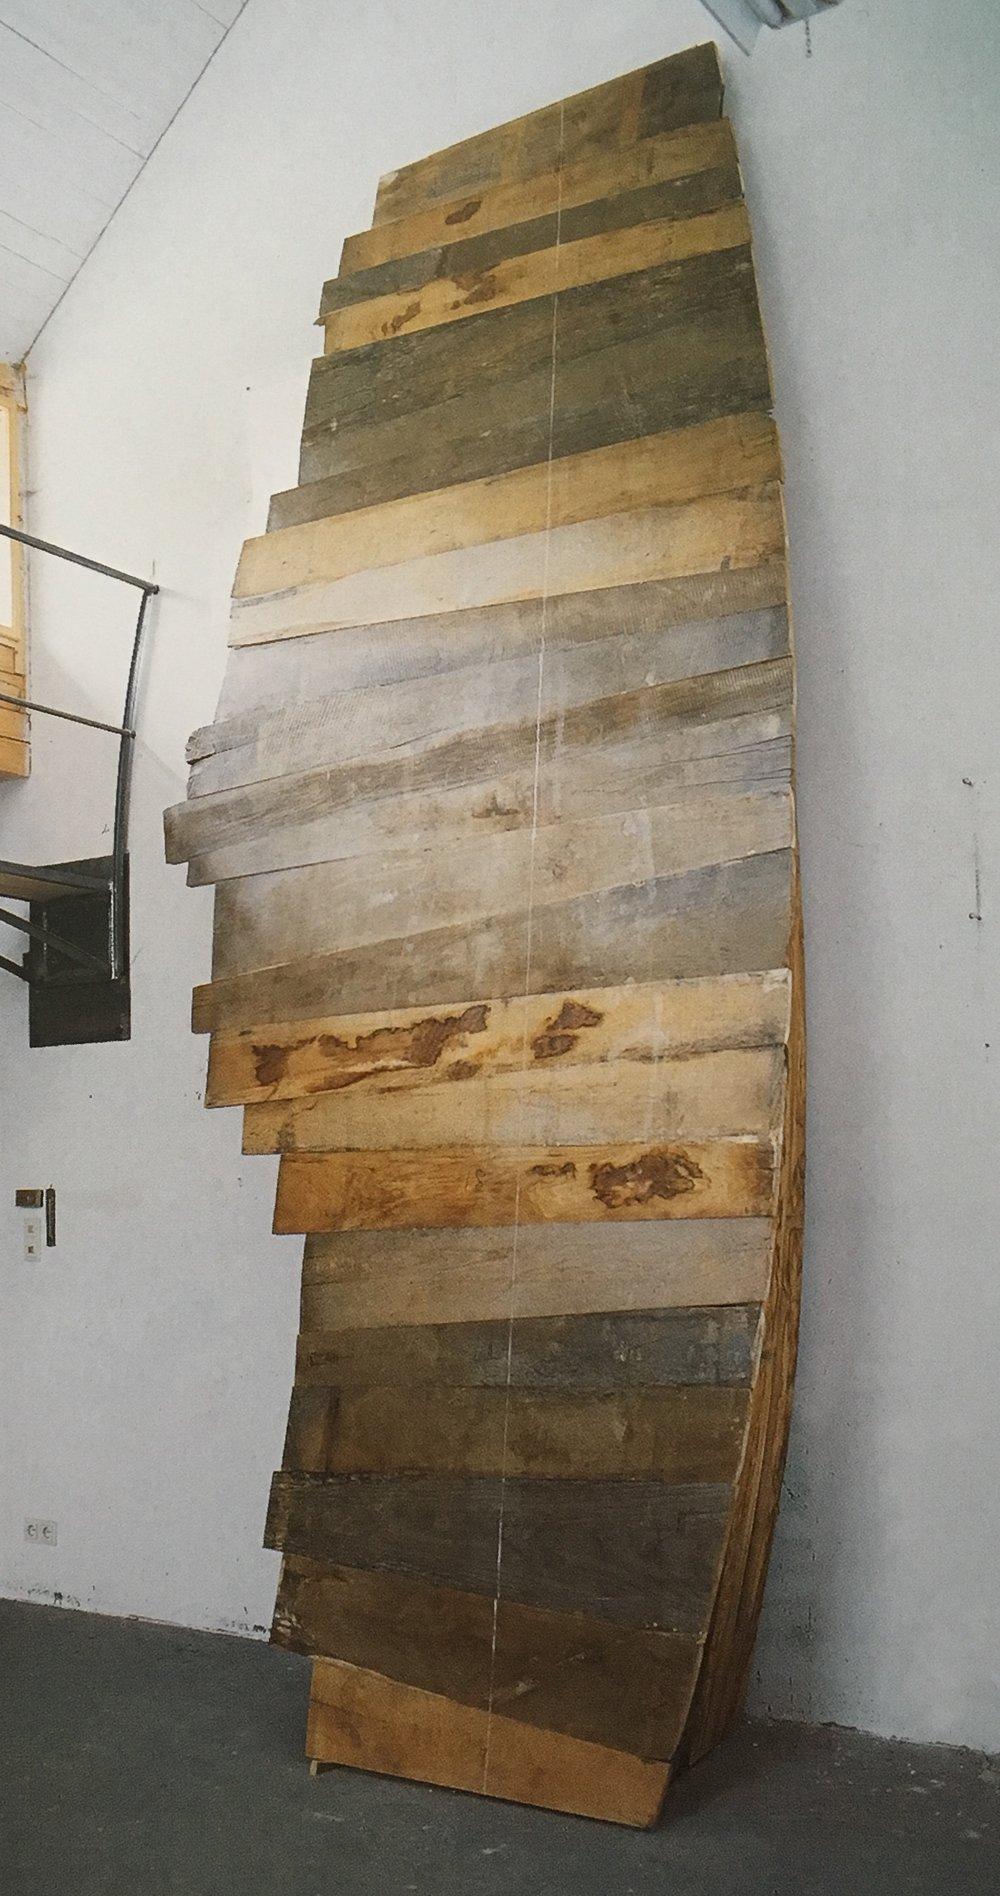 Aufwärtsgleitend , 1992, Oak wood, 188.99h x 62.99w x 35.43d cm (480h x 160w x 90d cm), Museum Moderner Kunst Stiftung Ludwig Wien